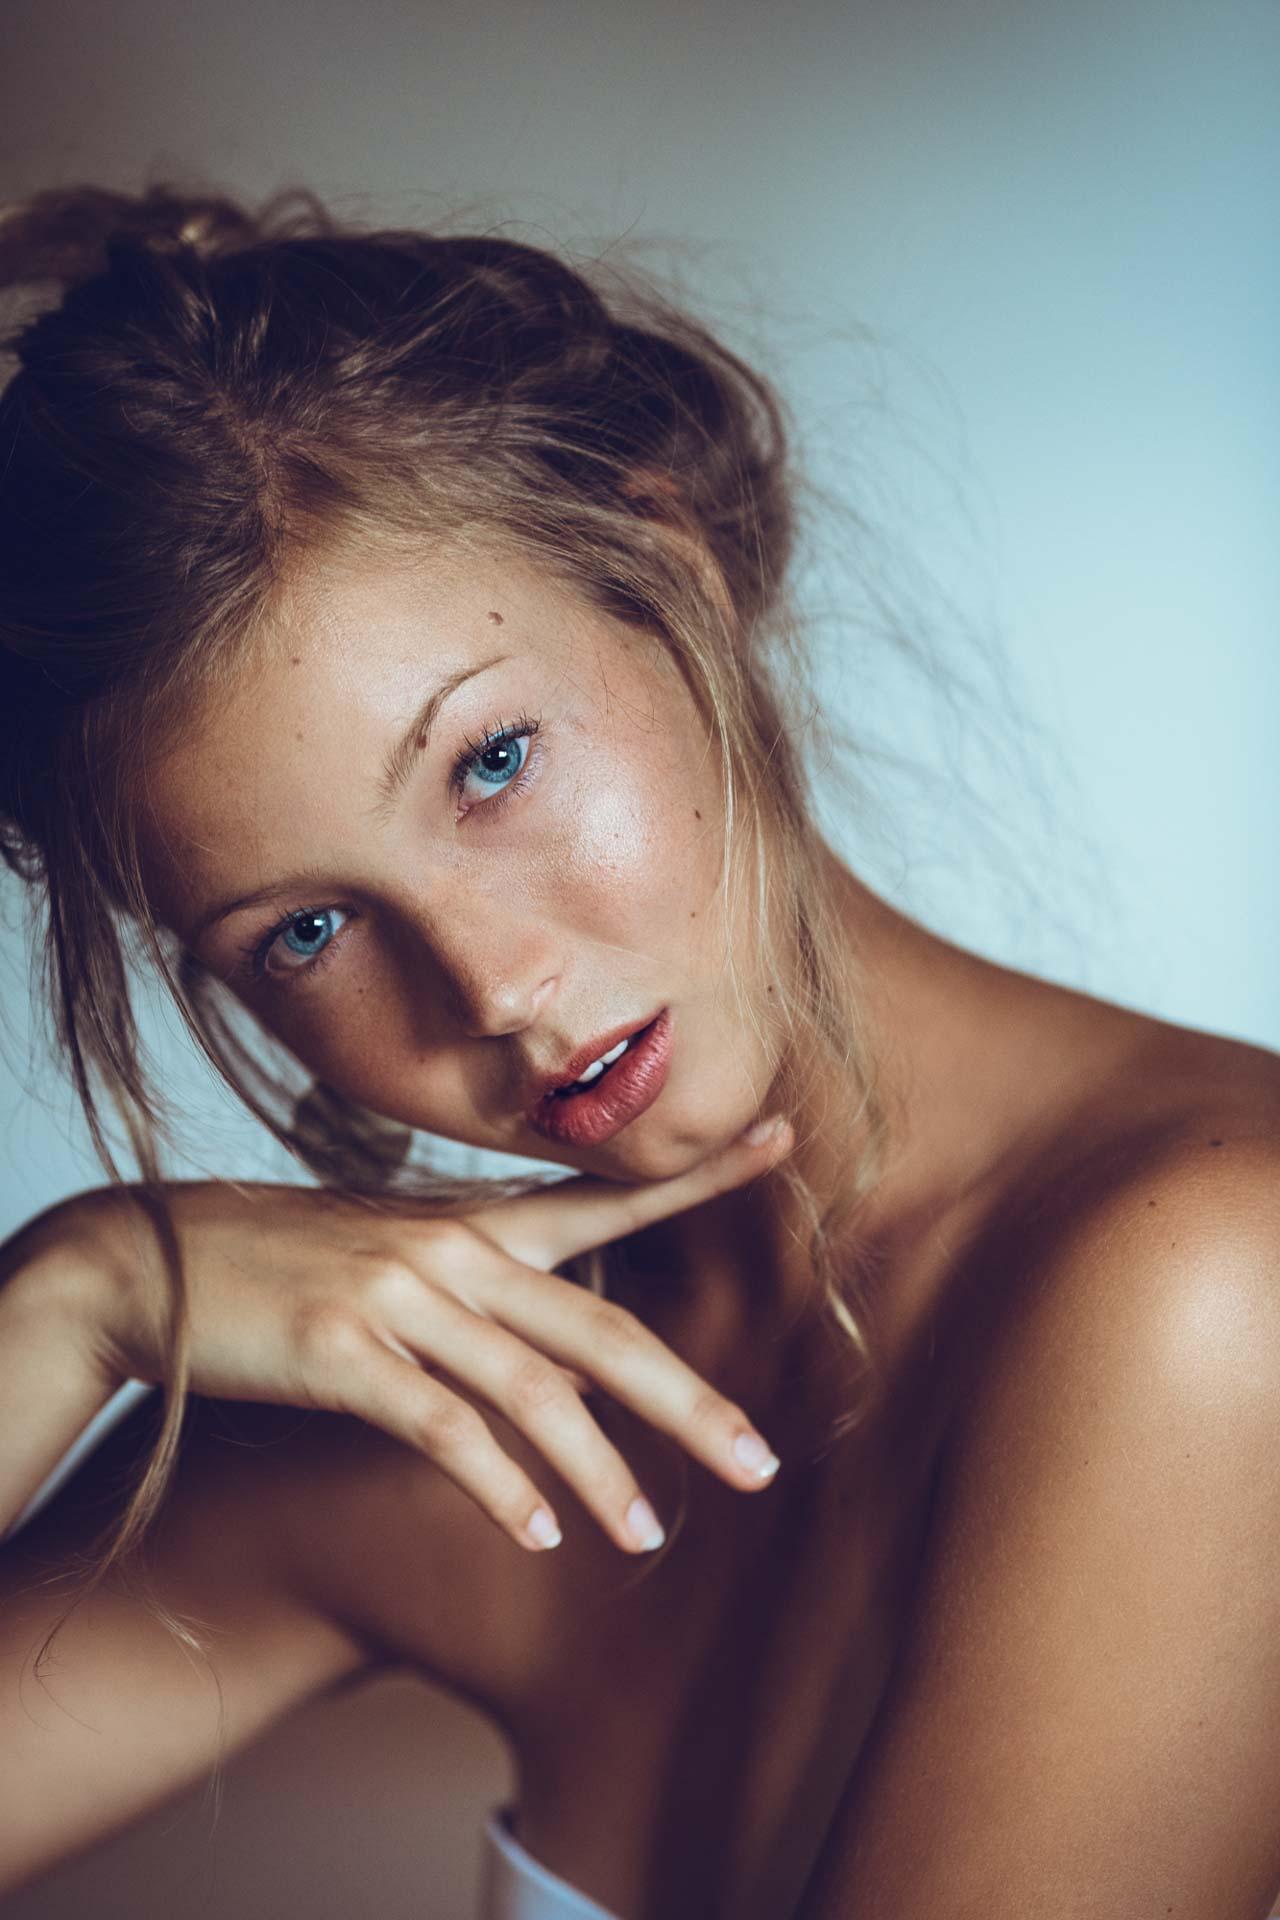 selbstliebe-fotoshooting-fotograf-dortmund-15